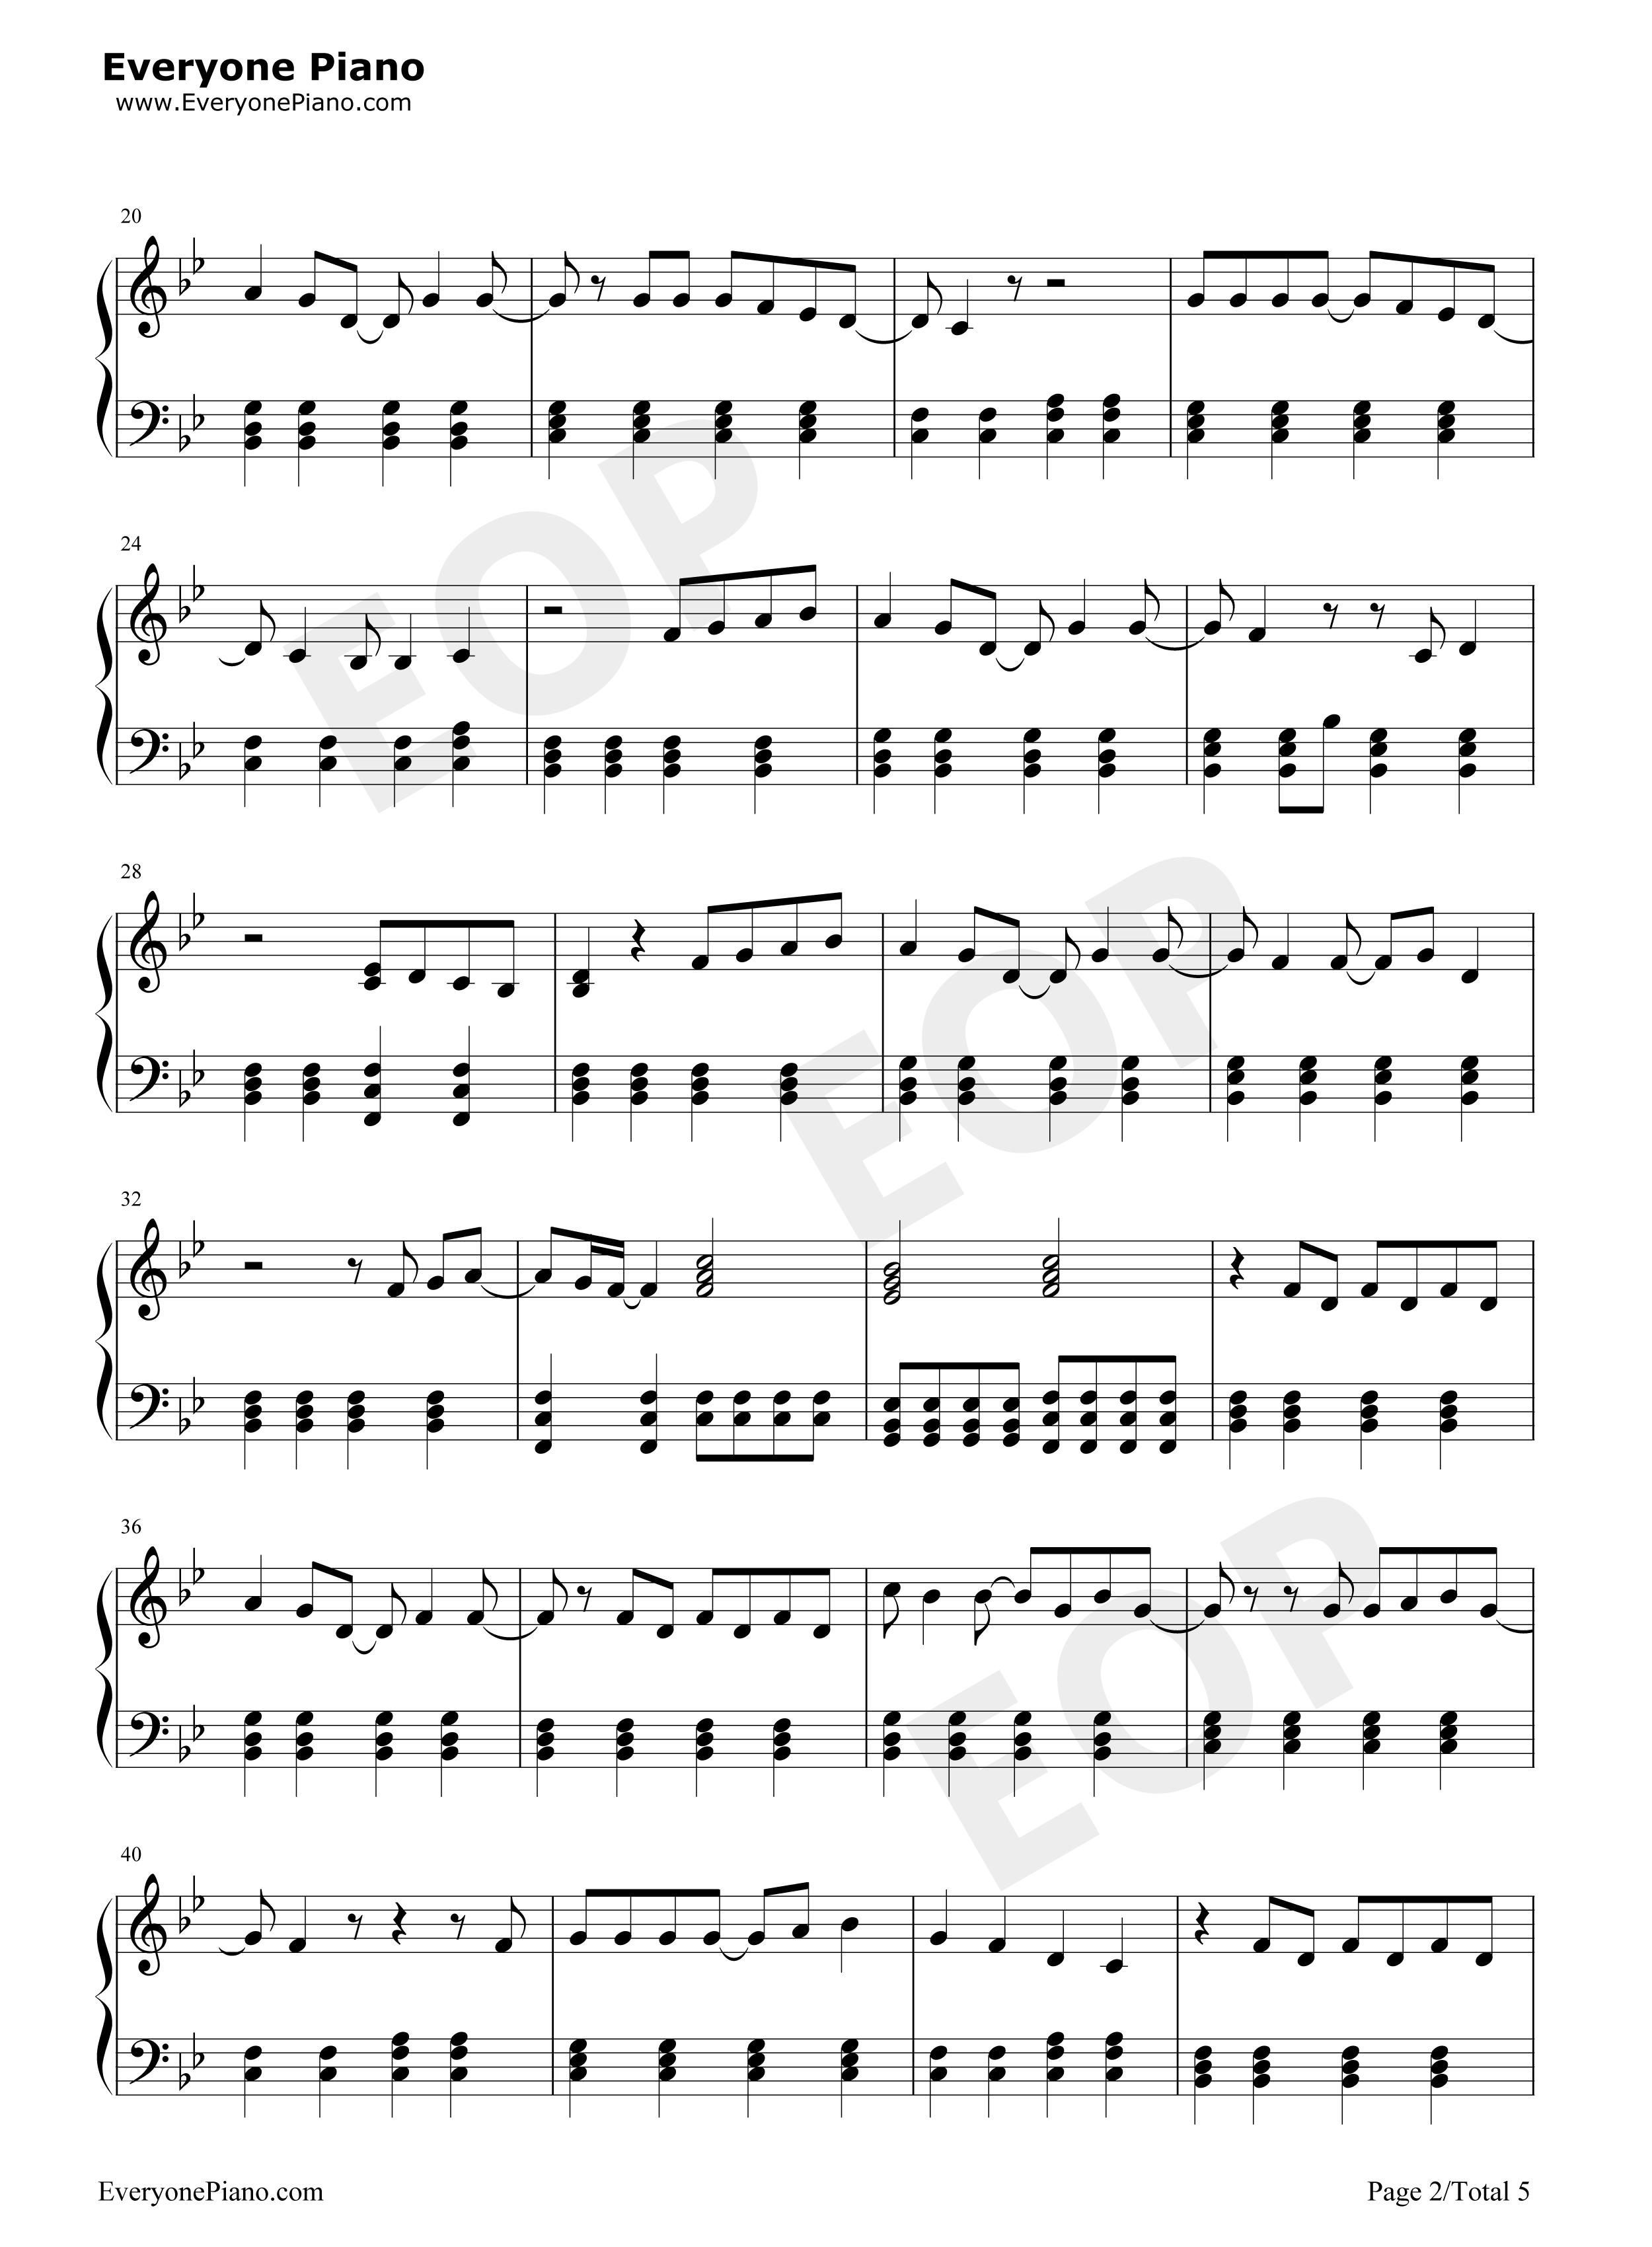 Piano sheet music preview 2 free piano sheet music amp piano chords